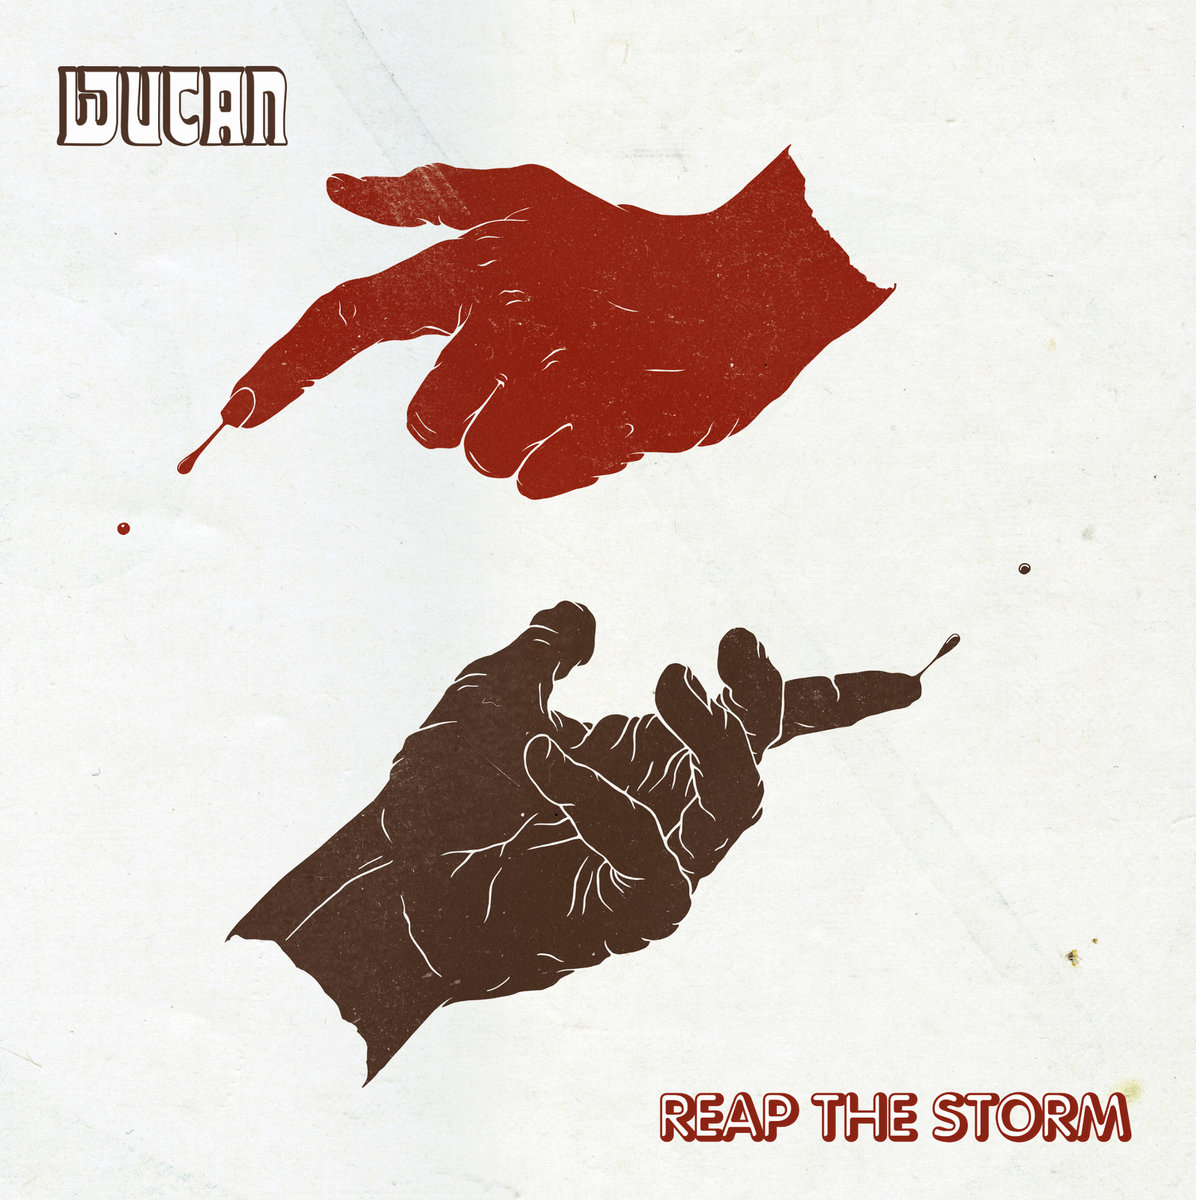 WUCAN -REAP THE STORM